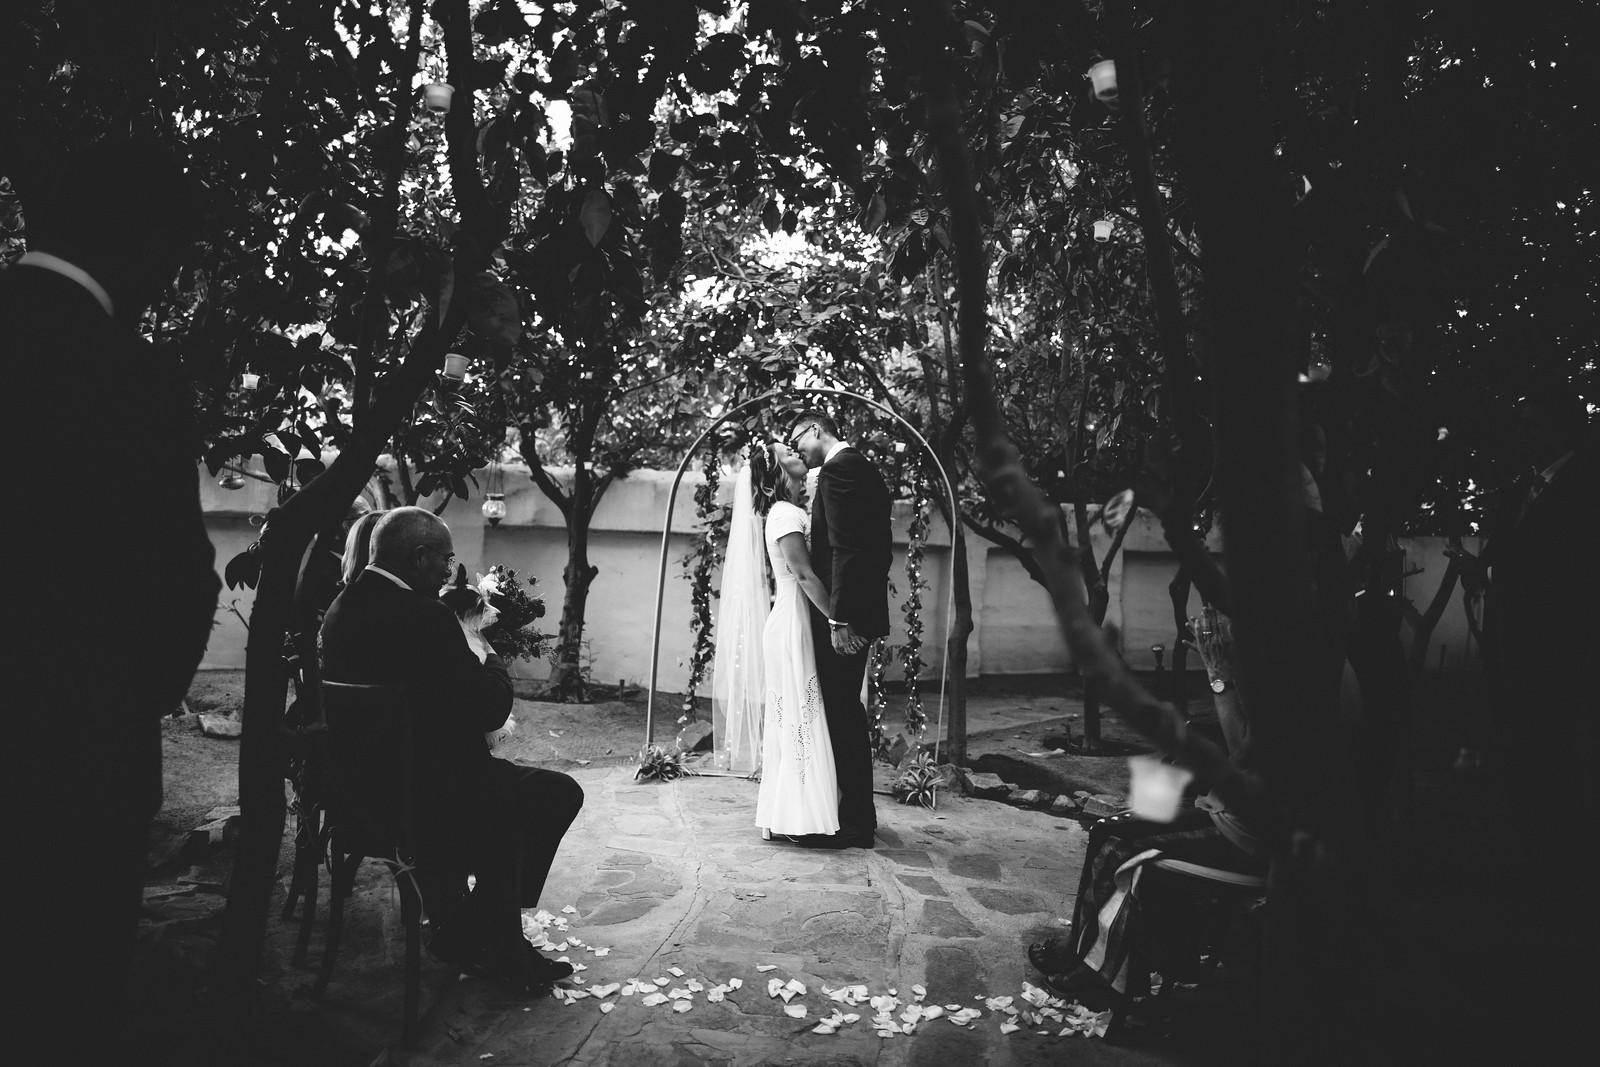 korakia-pensione-Wedding17.jpg